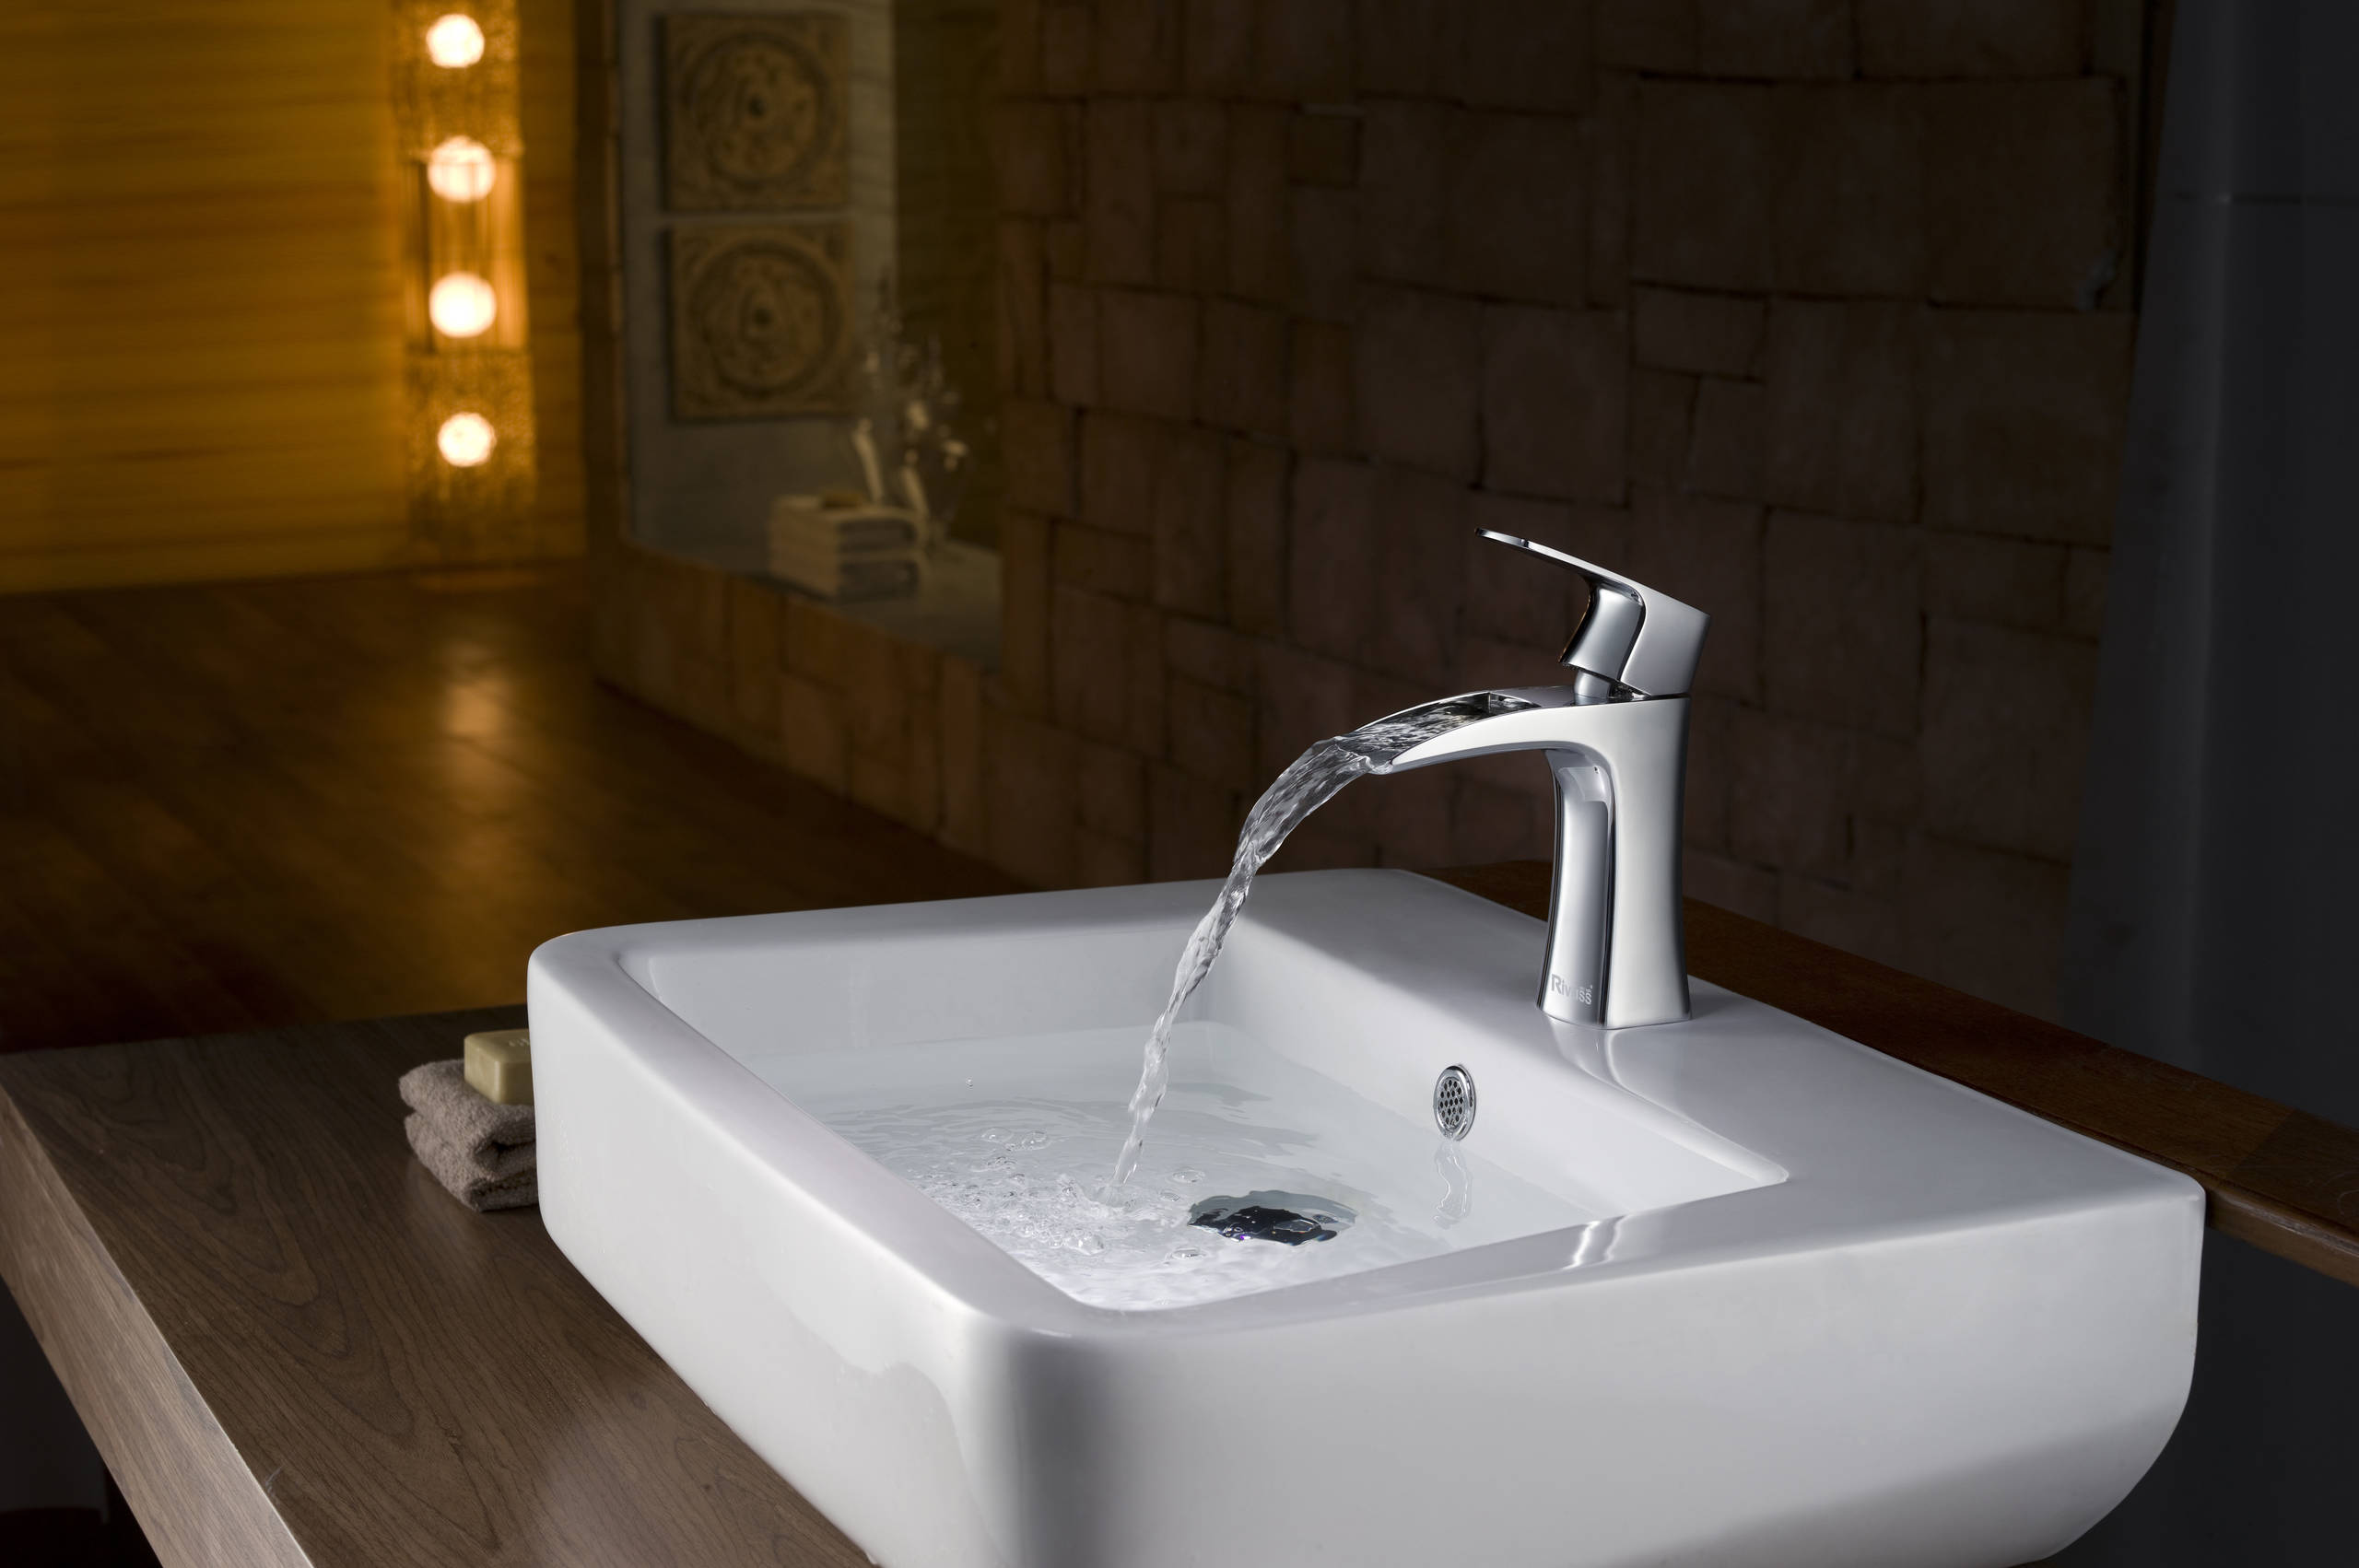 luxury bathroom faucet style which has longevity